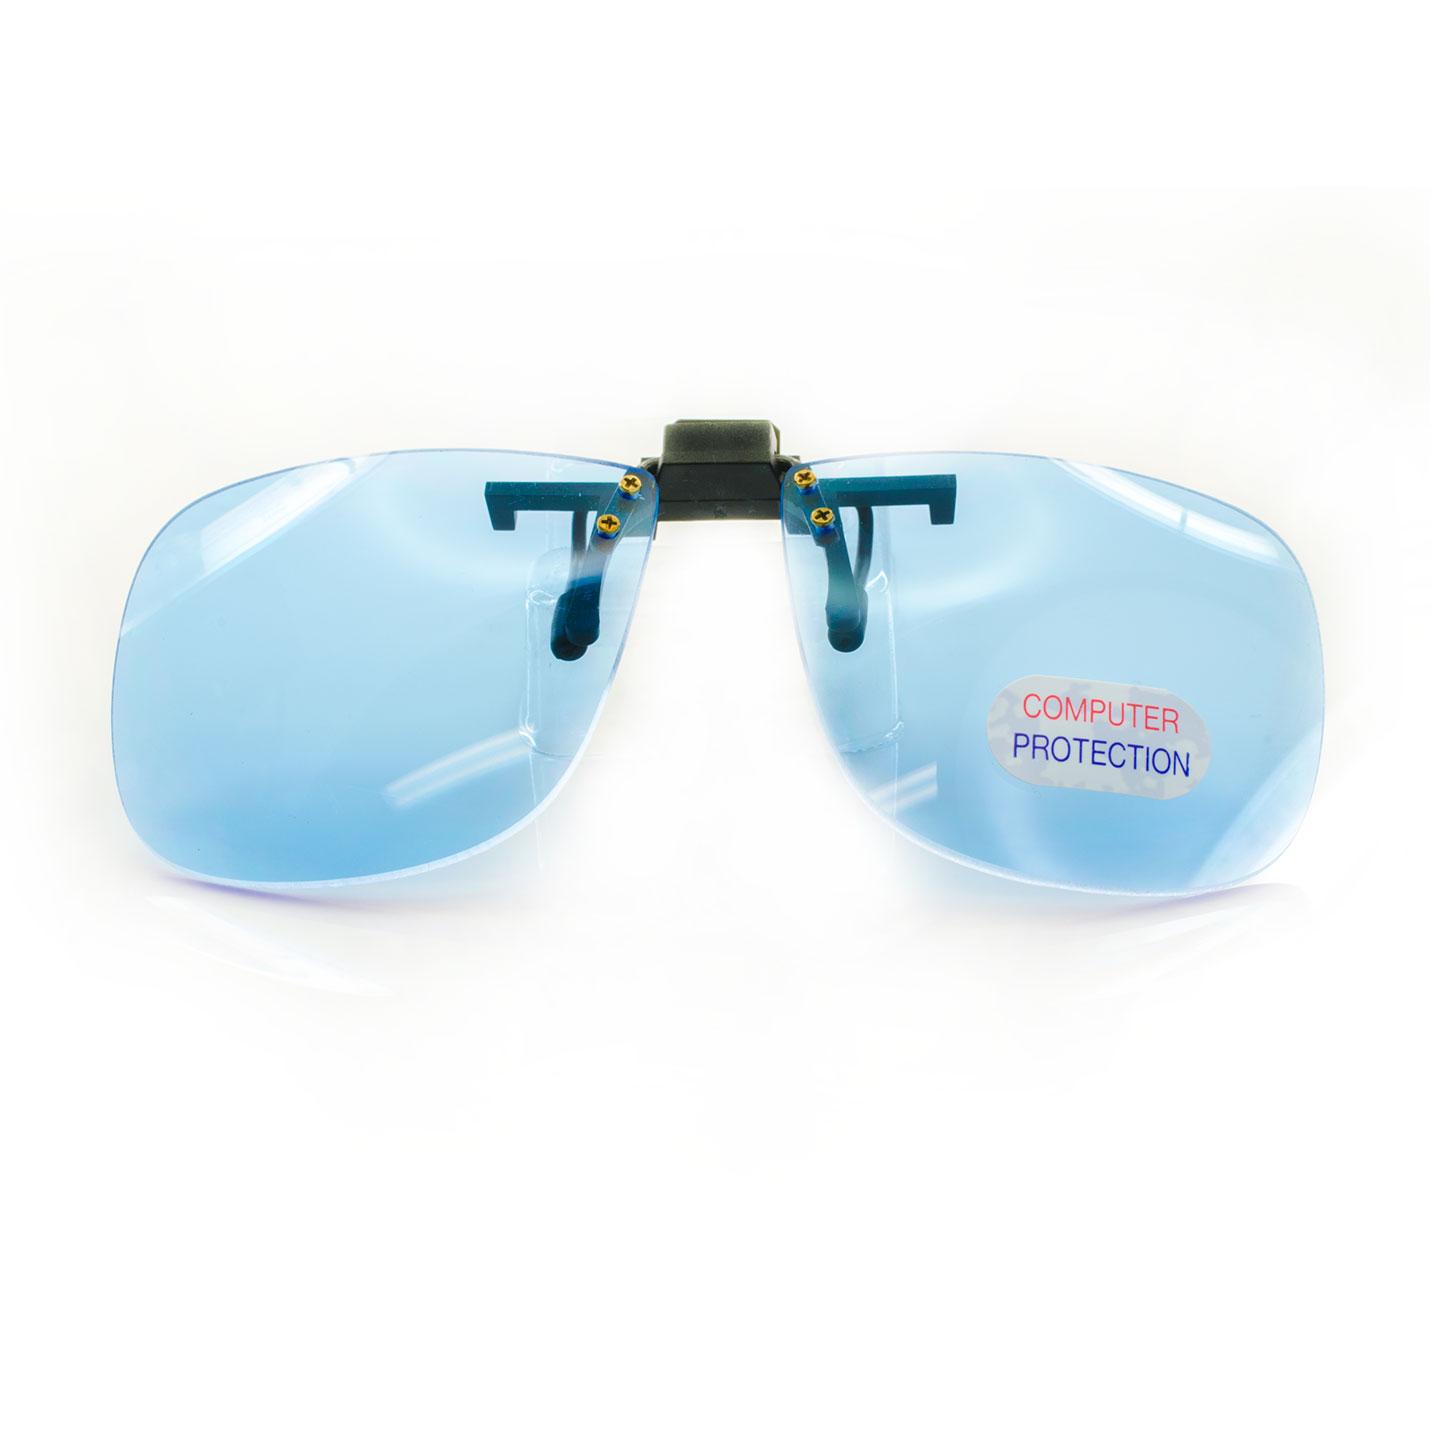 Flip-Up de protection bleu clair